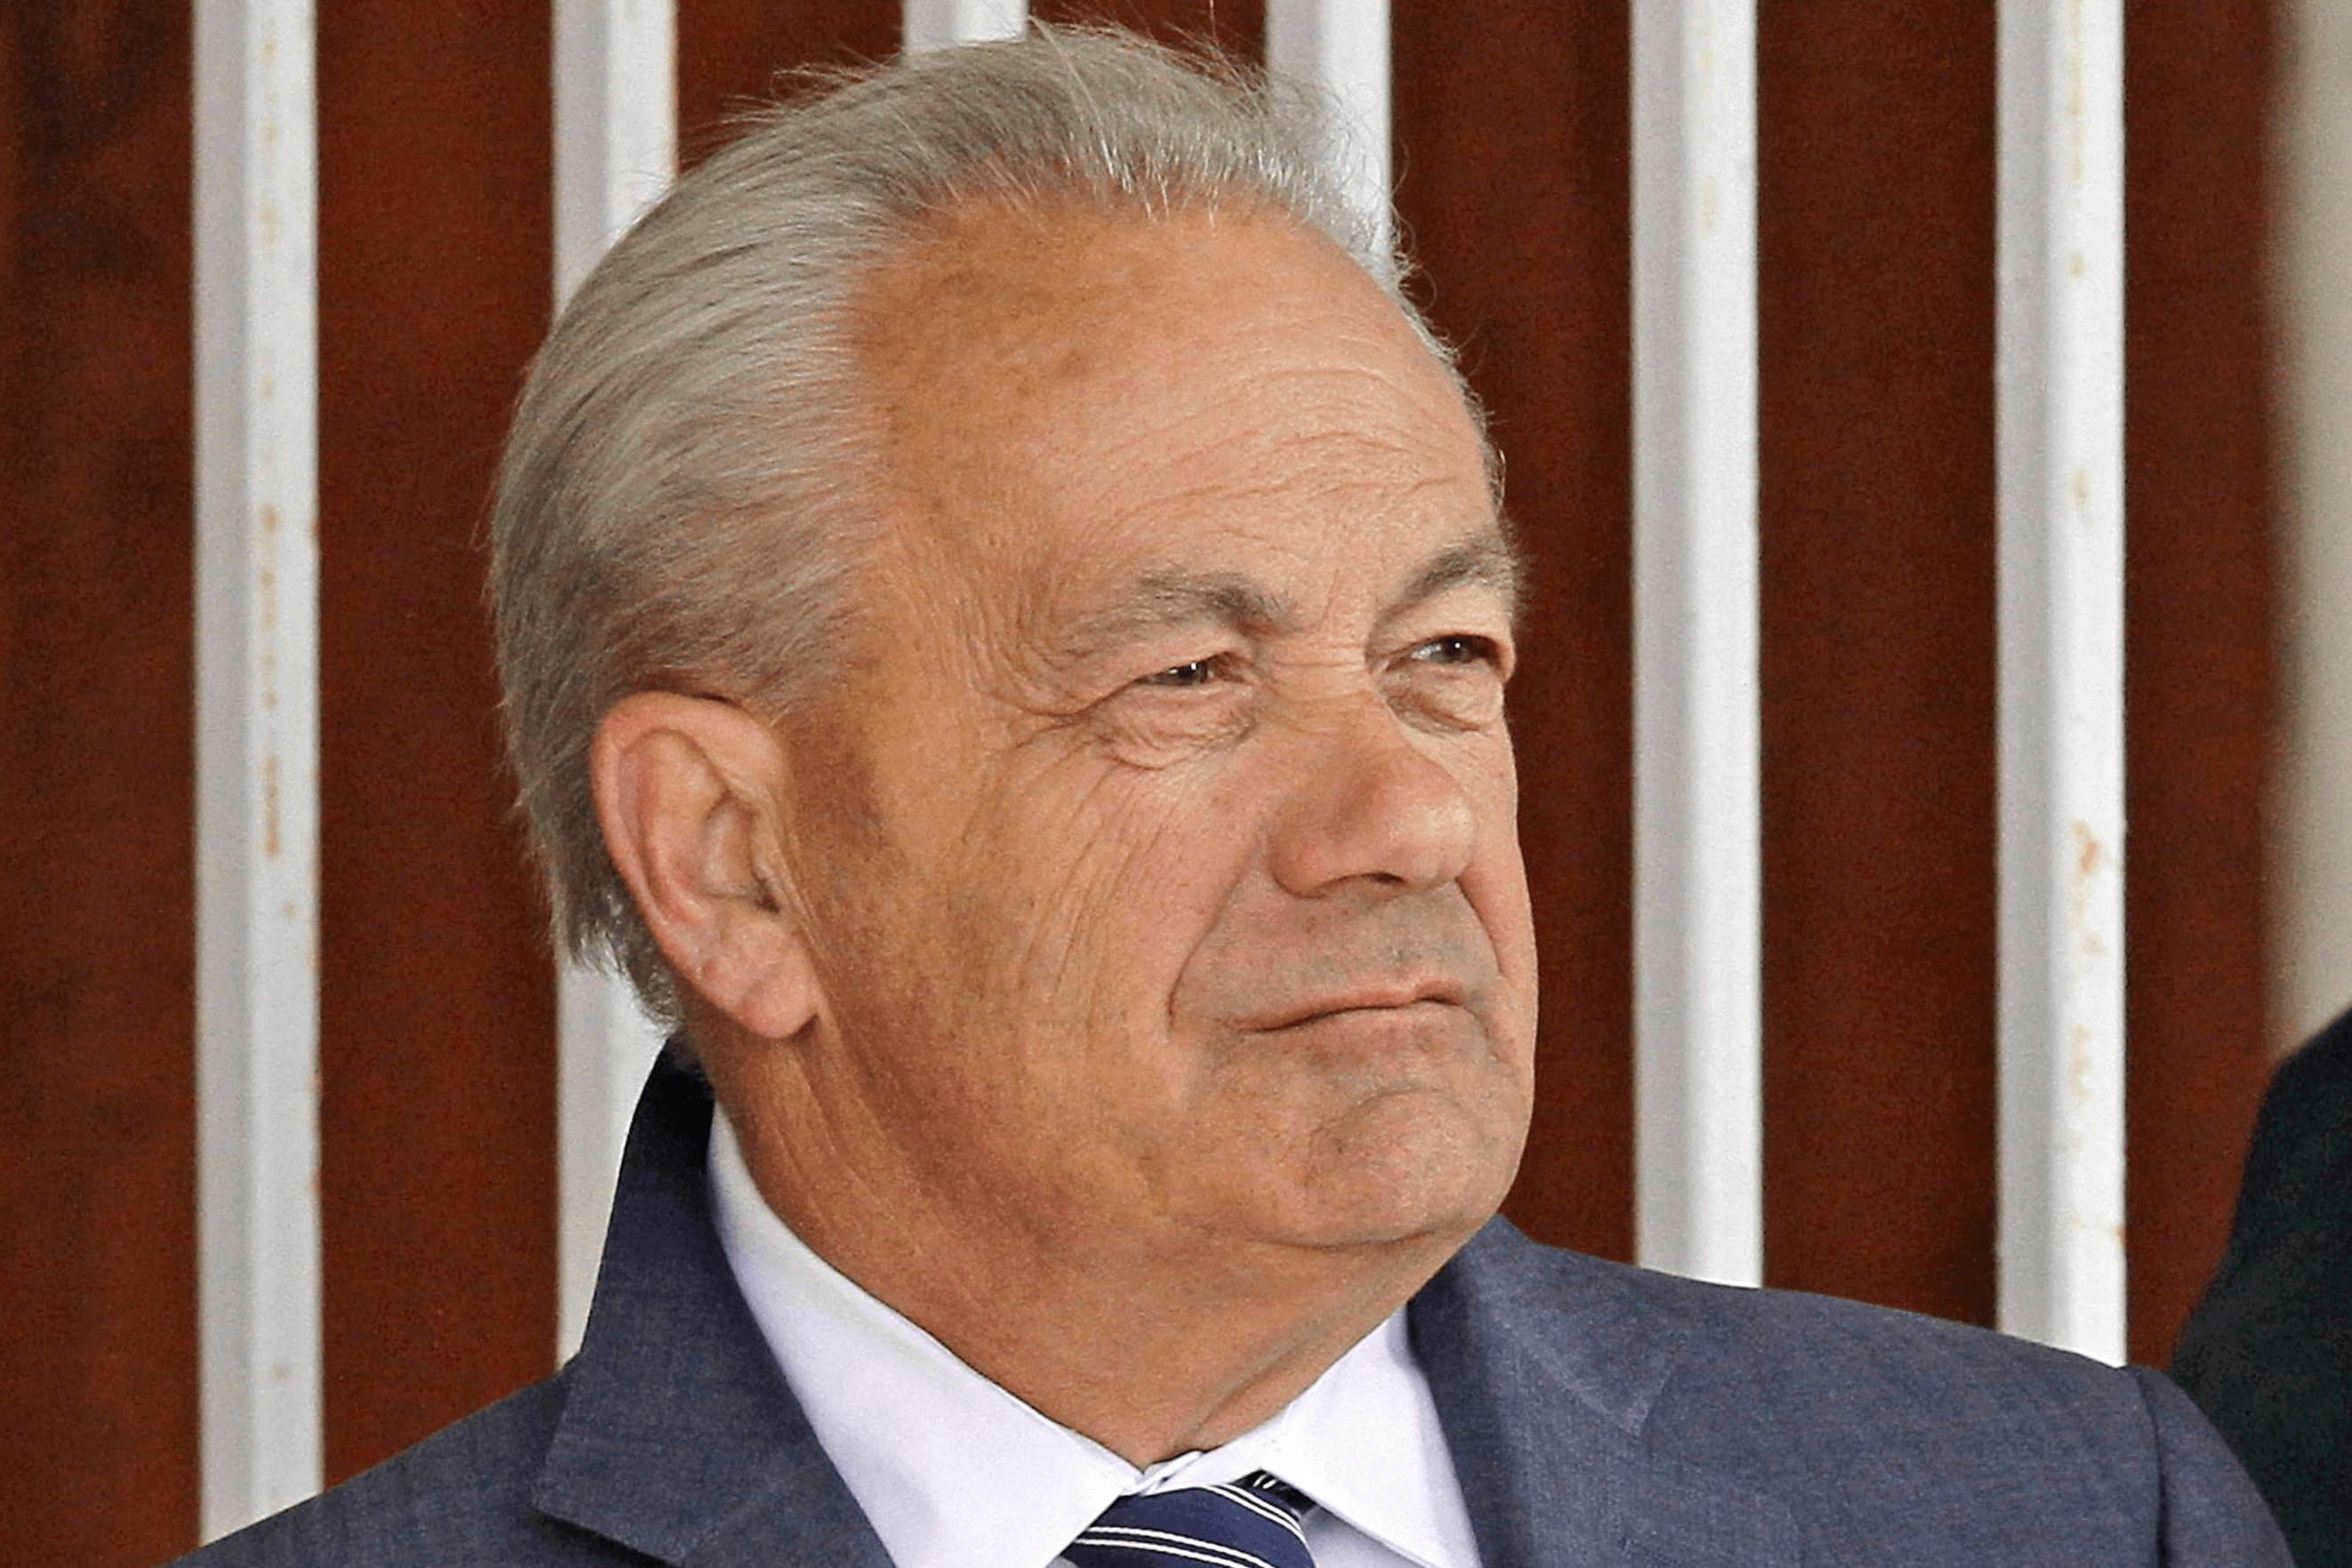 Jerry Hollendorfer